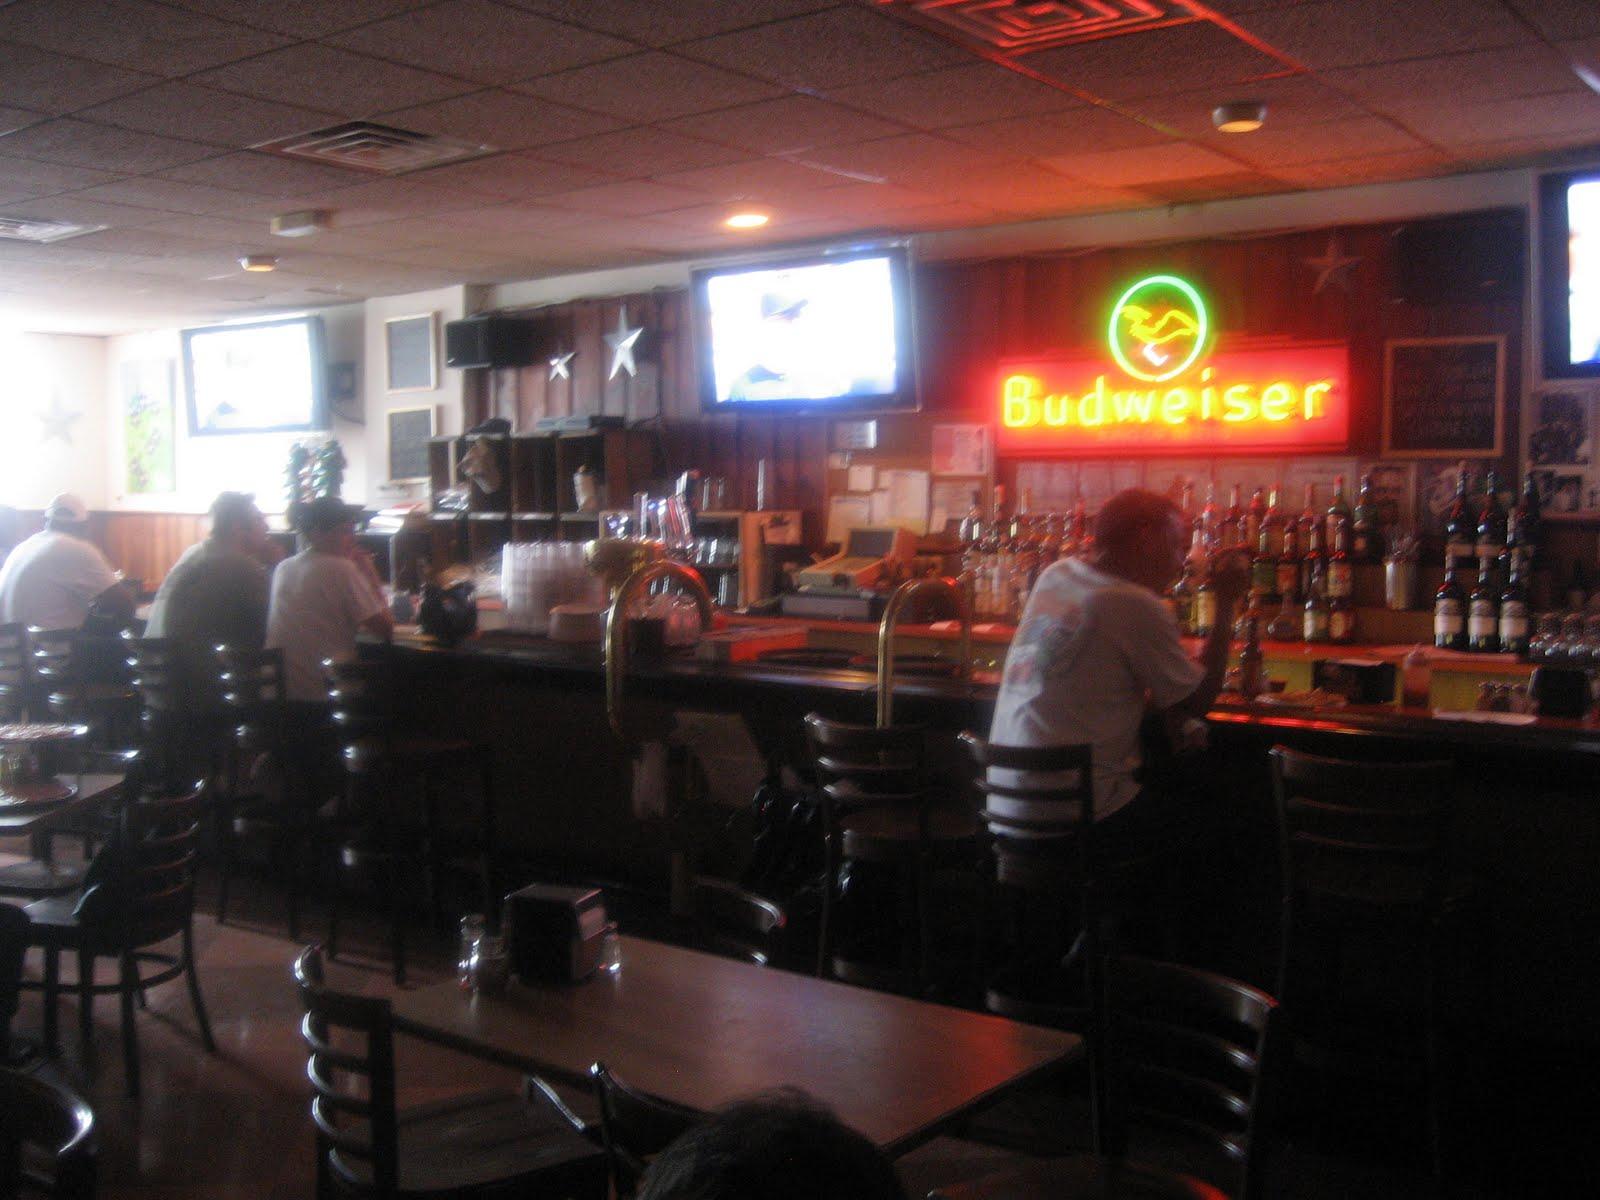 New Jersey's Star Tavern: Raising The Bar (Pie) | I Dream Of